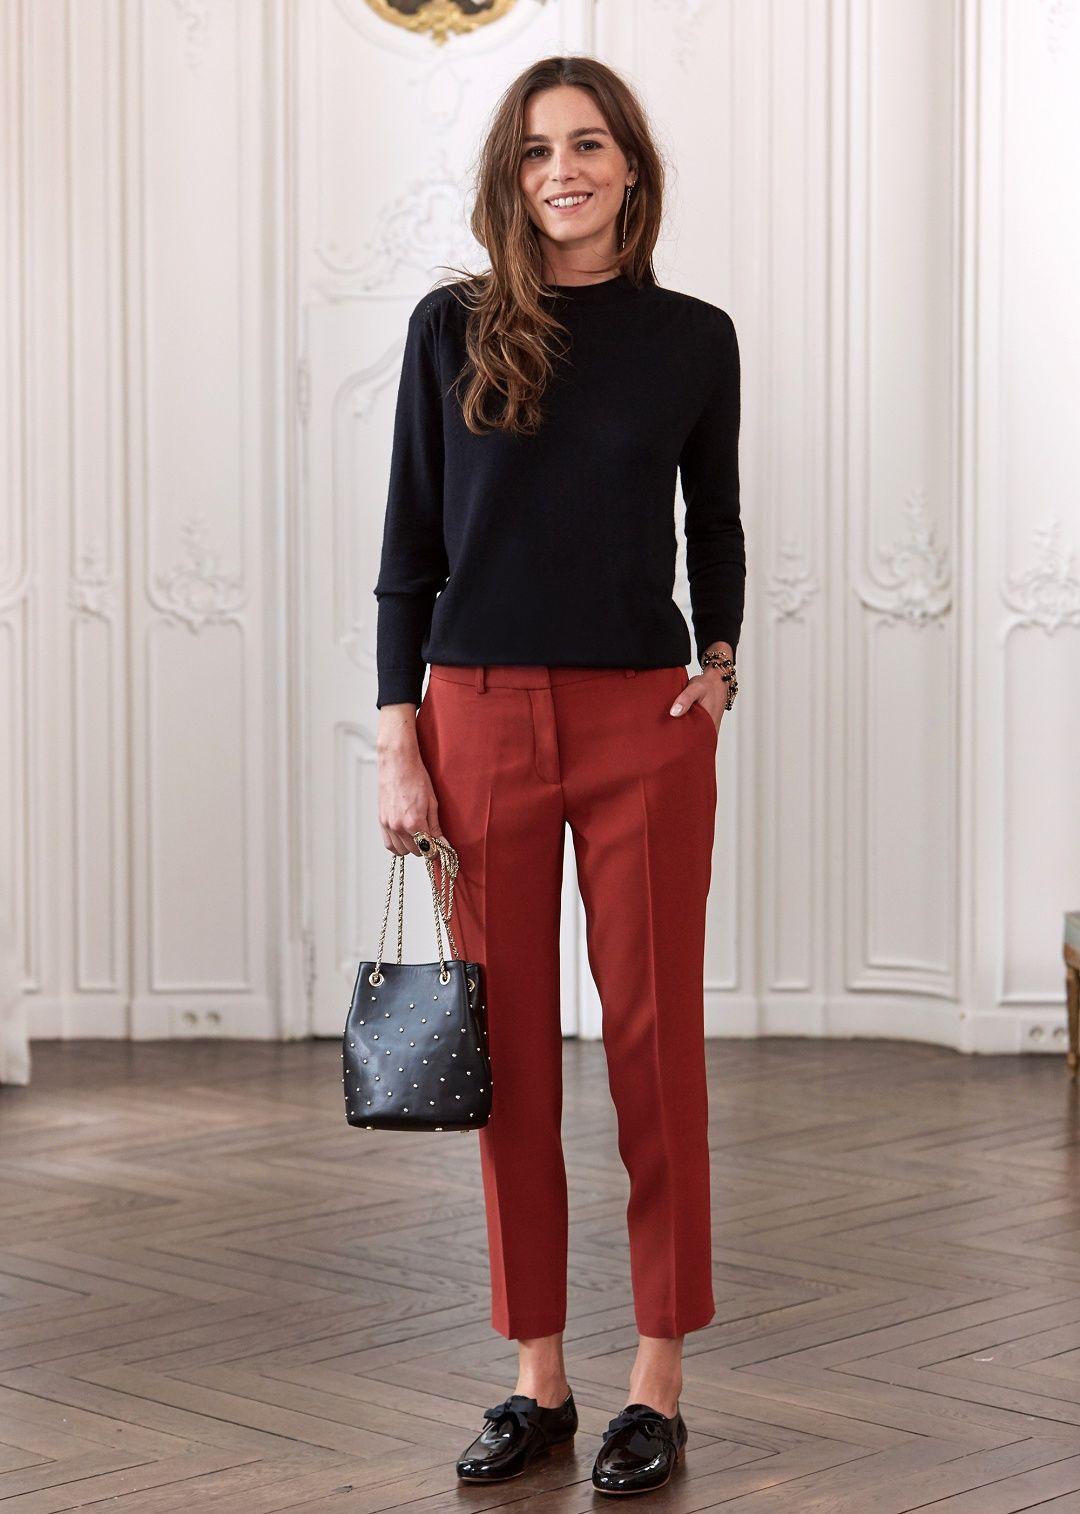 Sezane' Winter Collection Launched Today Moda Estilo